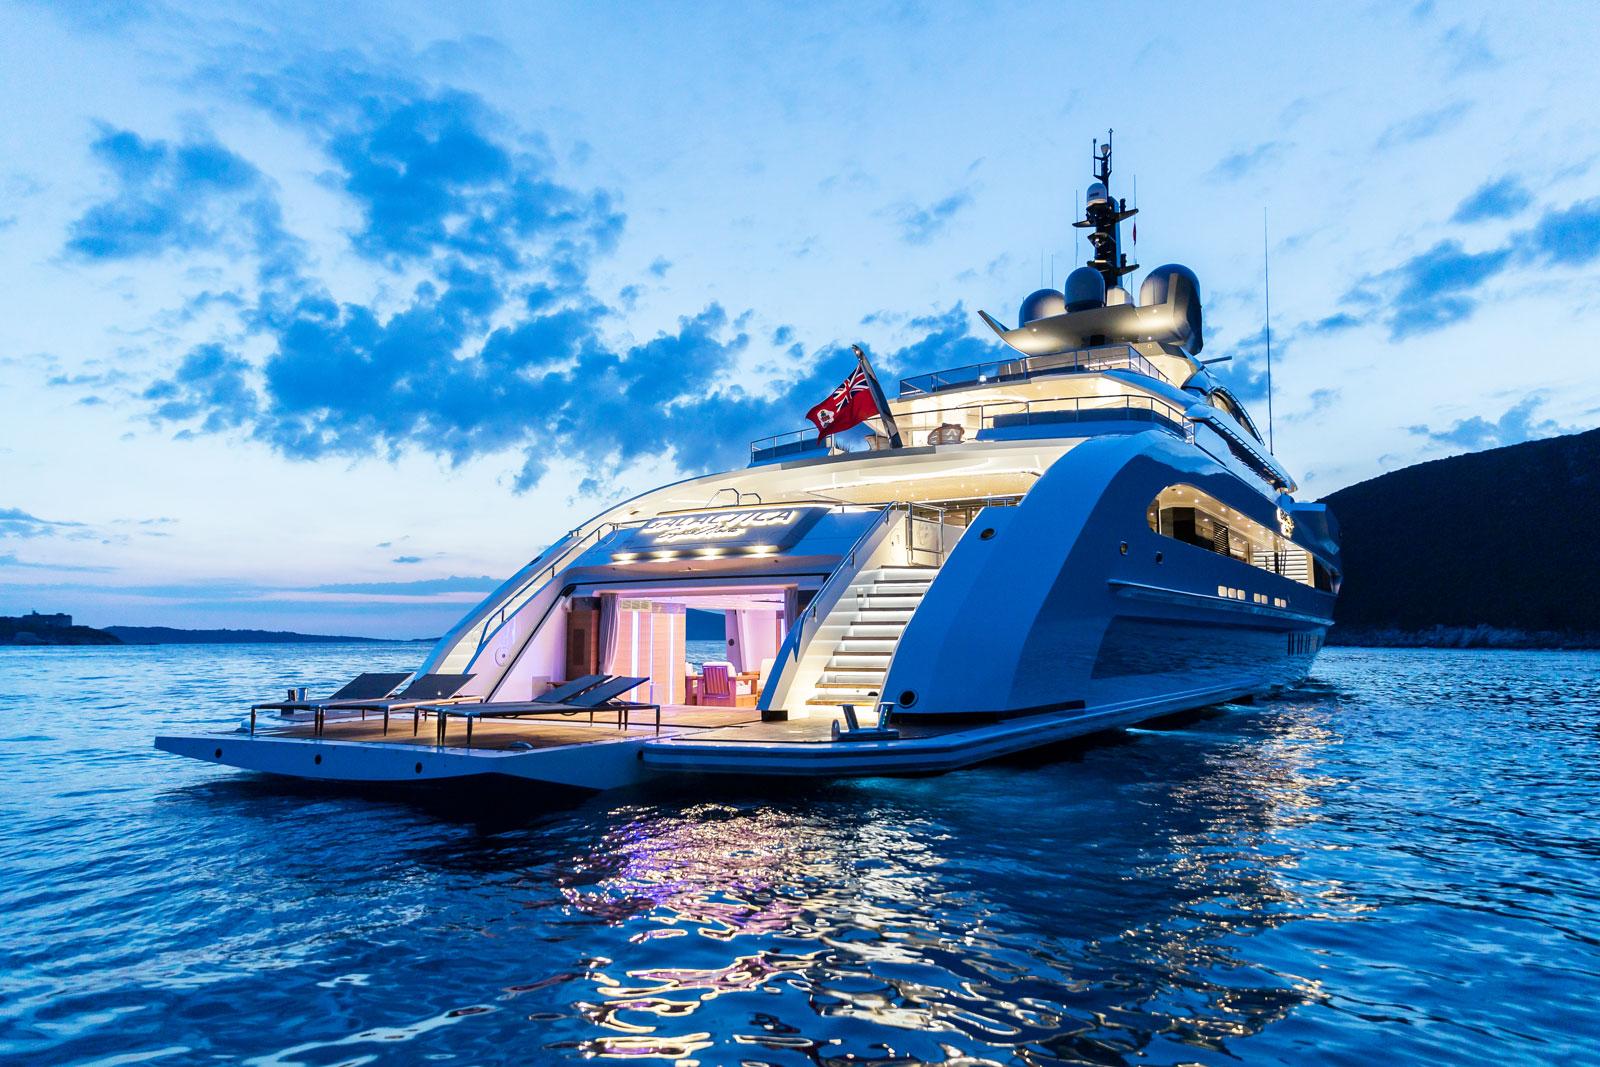 An Amazing Experience In The Côte d'Azur Aboard The Heesen Galactica Super Nova 5